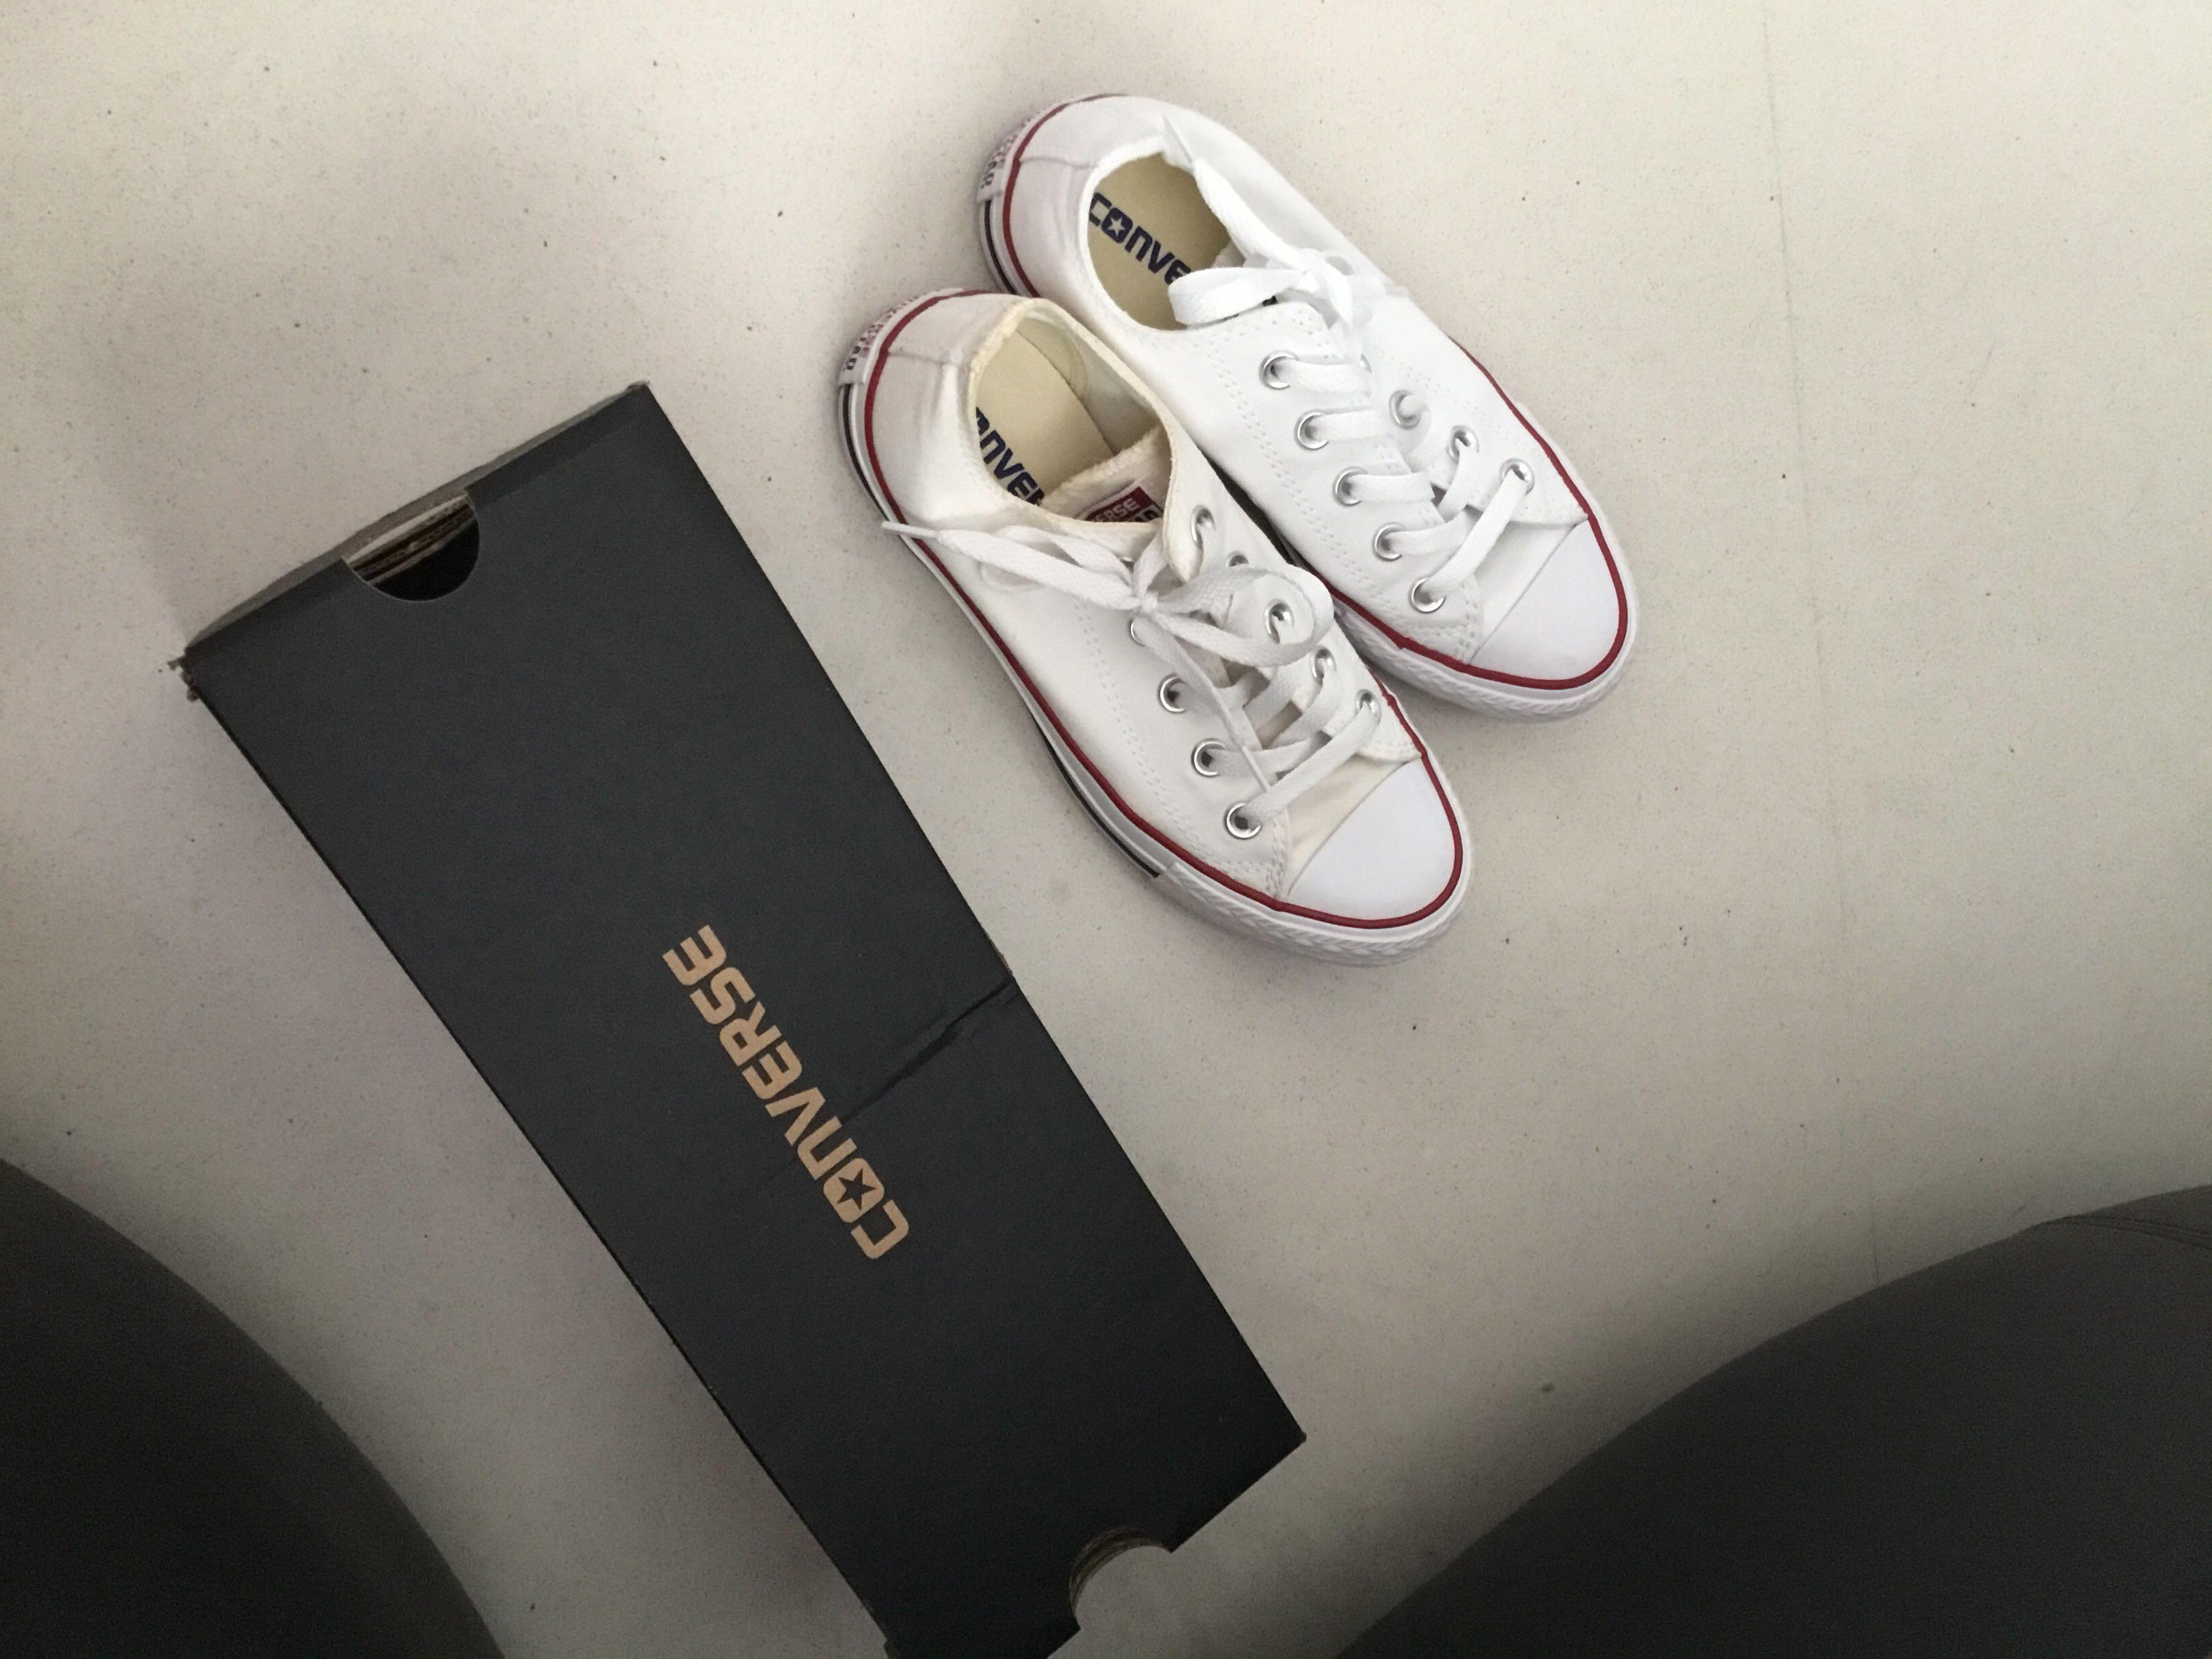 7760f6d8e248 Converse Chuck Taylor All Star White Shoes